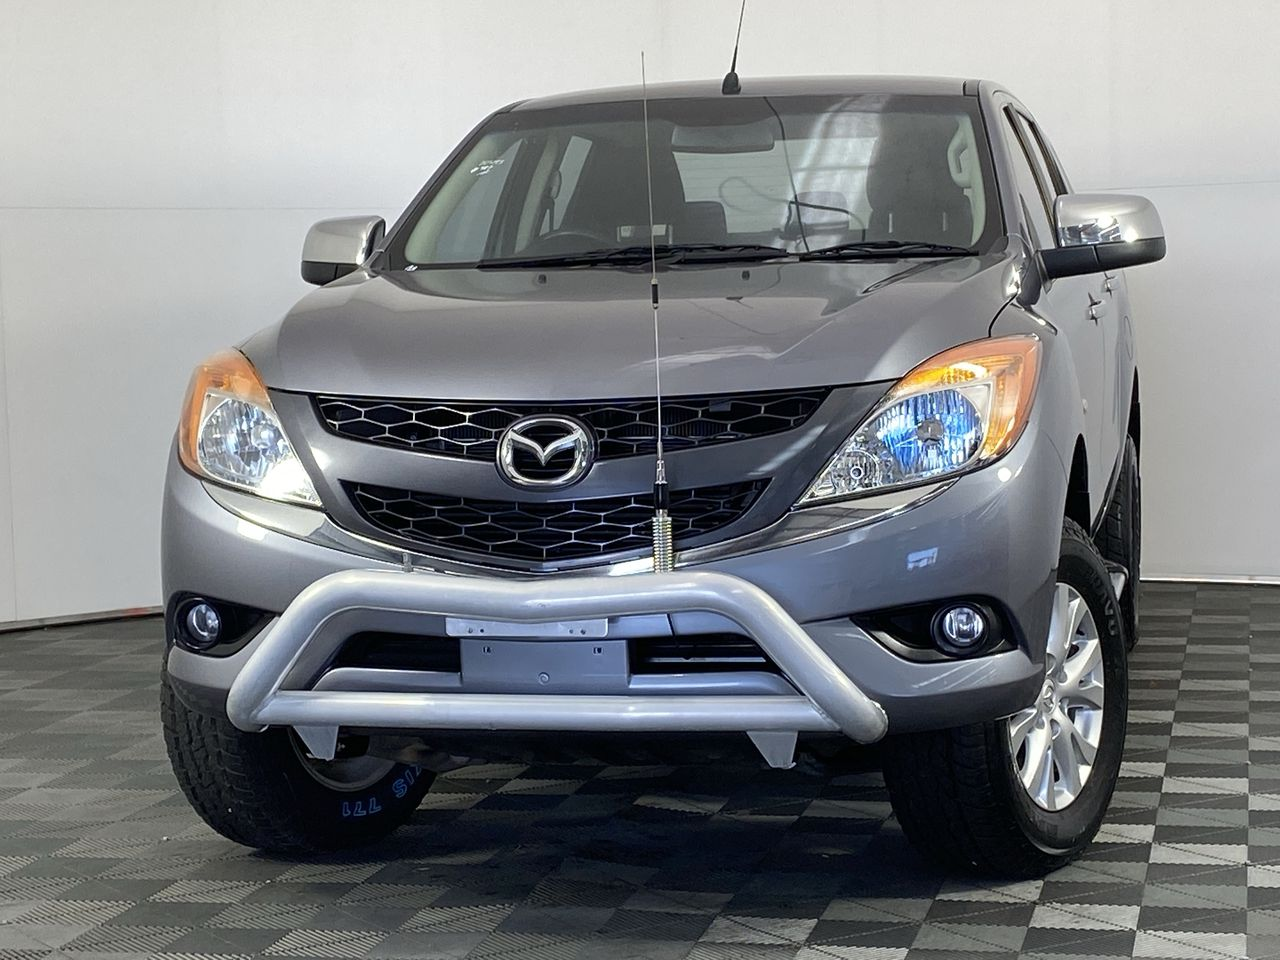 2014 Mazda BT-50 4X2 XTR Turbo Diesel Automatic Dual Cab(WOVR)